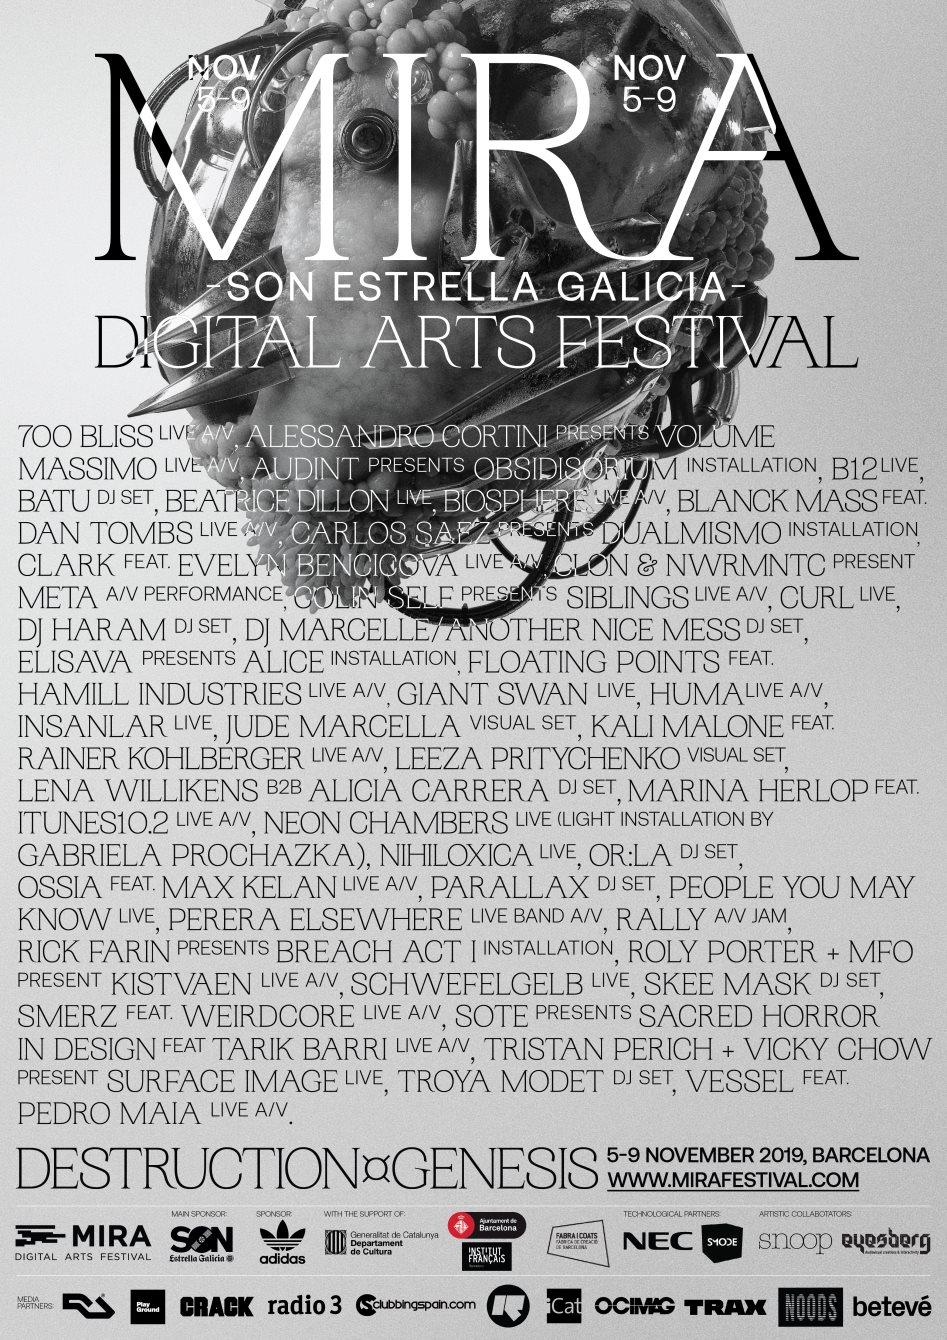 Mira Festival 2019 - Flyer front